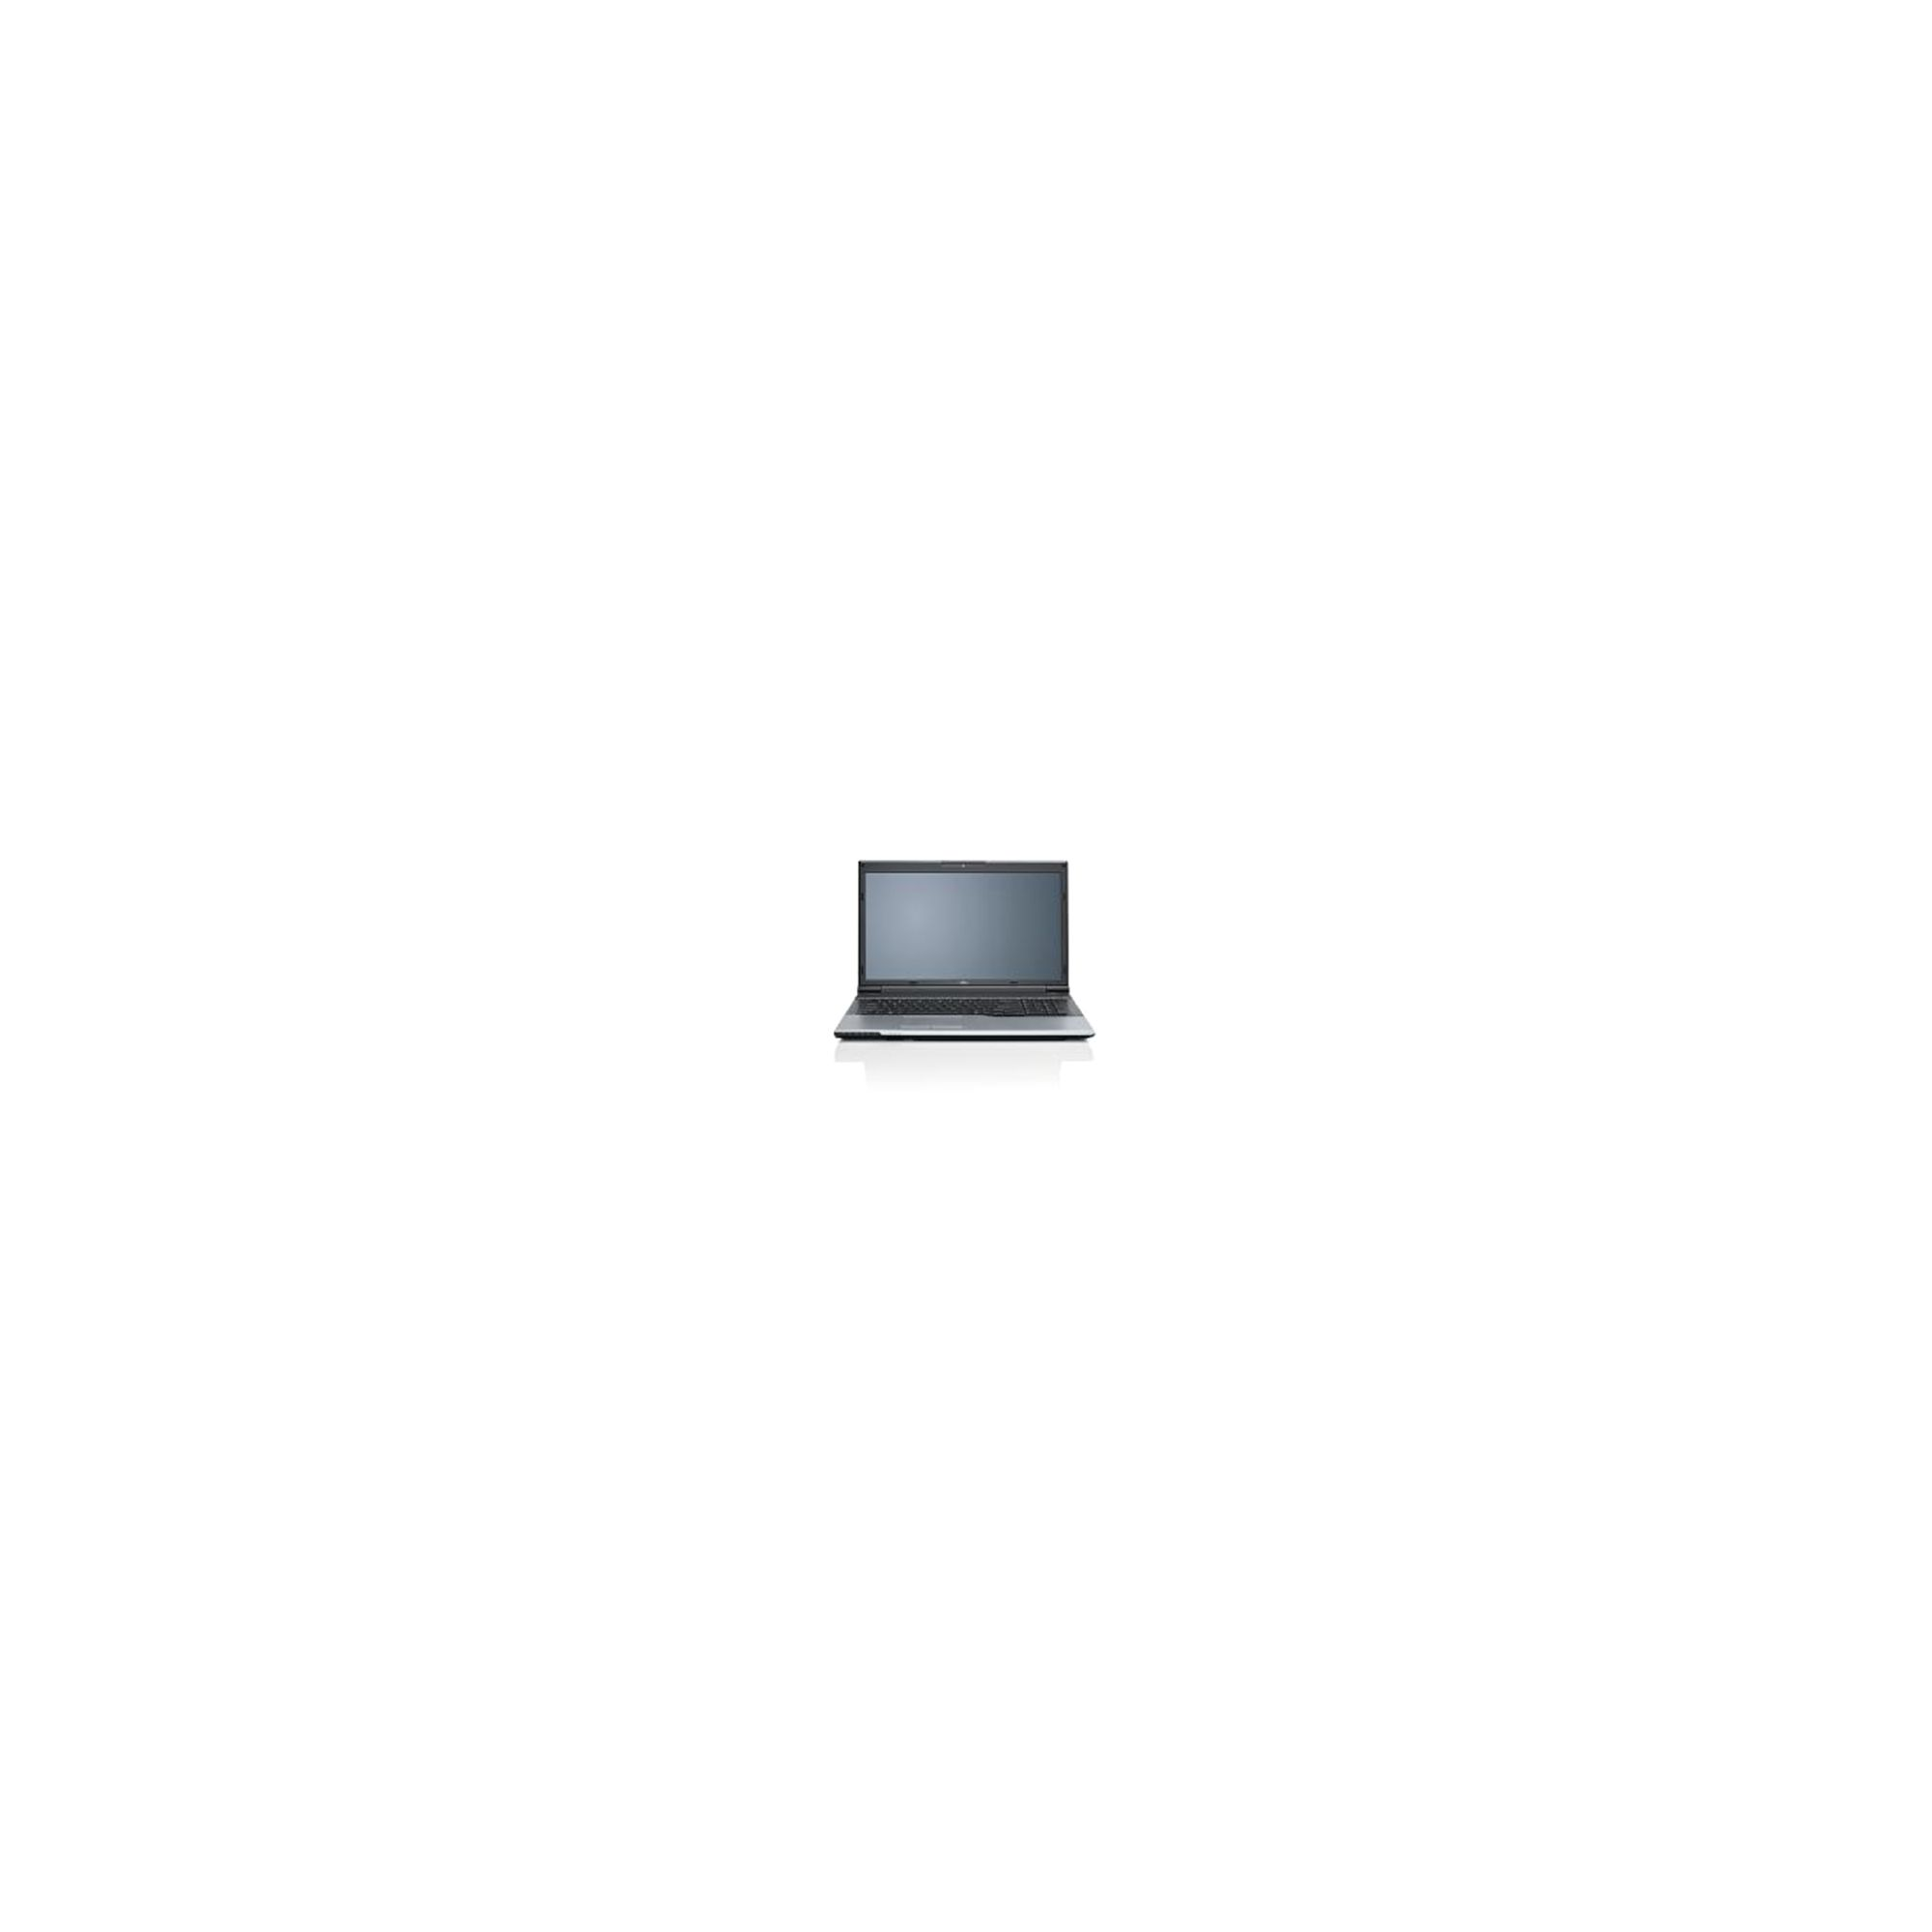 Fujitsu LIFEBOOK N532 (17.3 inch) Notebook Core i7 (3630QM) 2.4GHz 6GB 750GB DVD (SM) WLAN BT Webcam Windows 8 Pro 64-bit (Nvidia GeForce GT 620M) at Tesco Direct